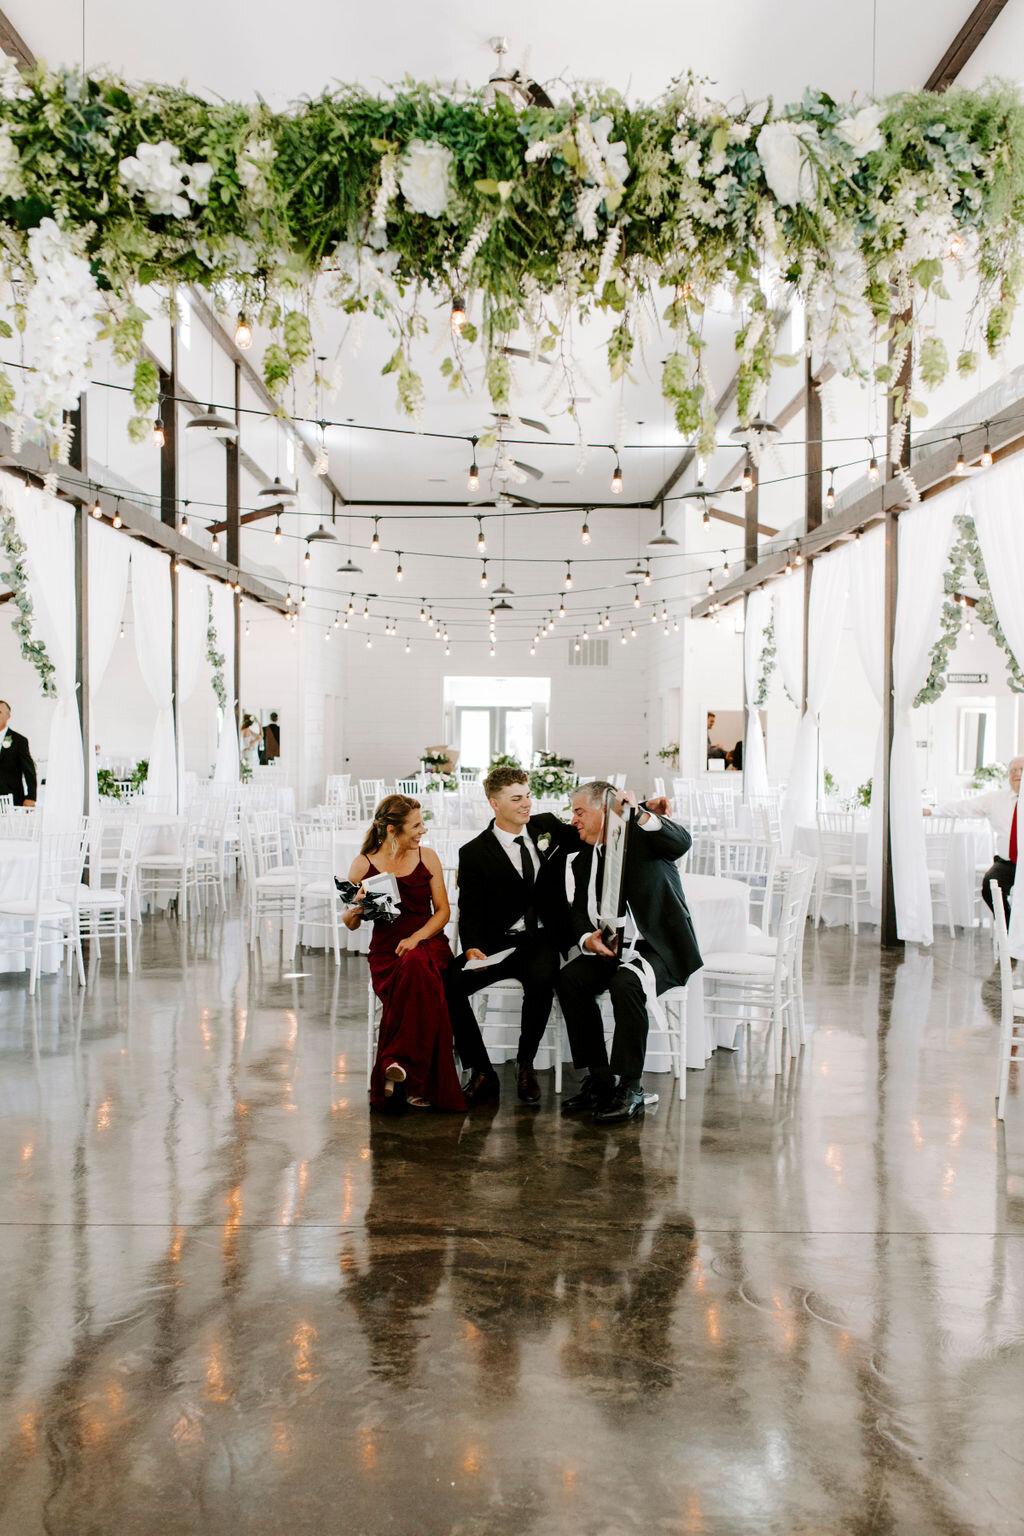 Tulsa White Barn Wedding Venue Outdoor Ceremony 58.jpg